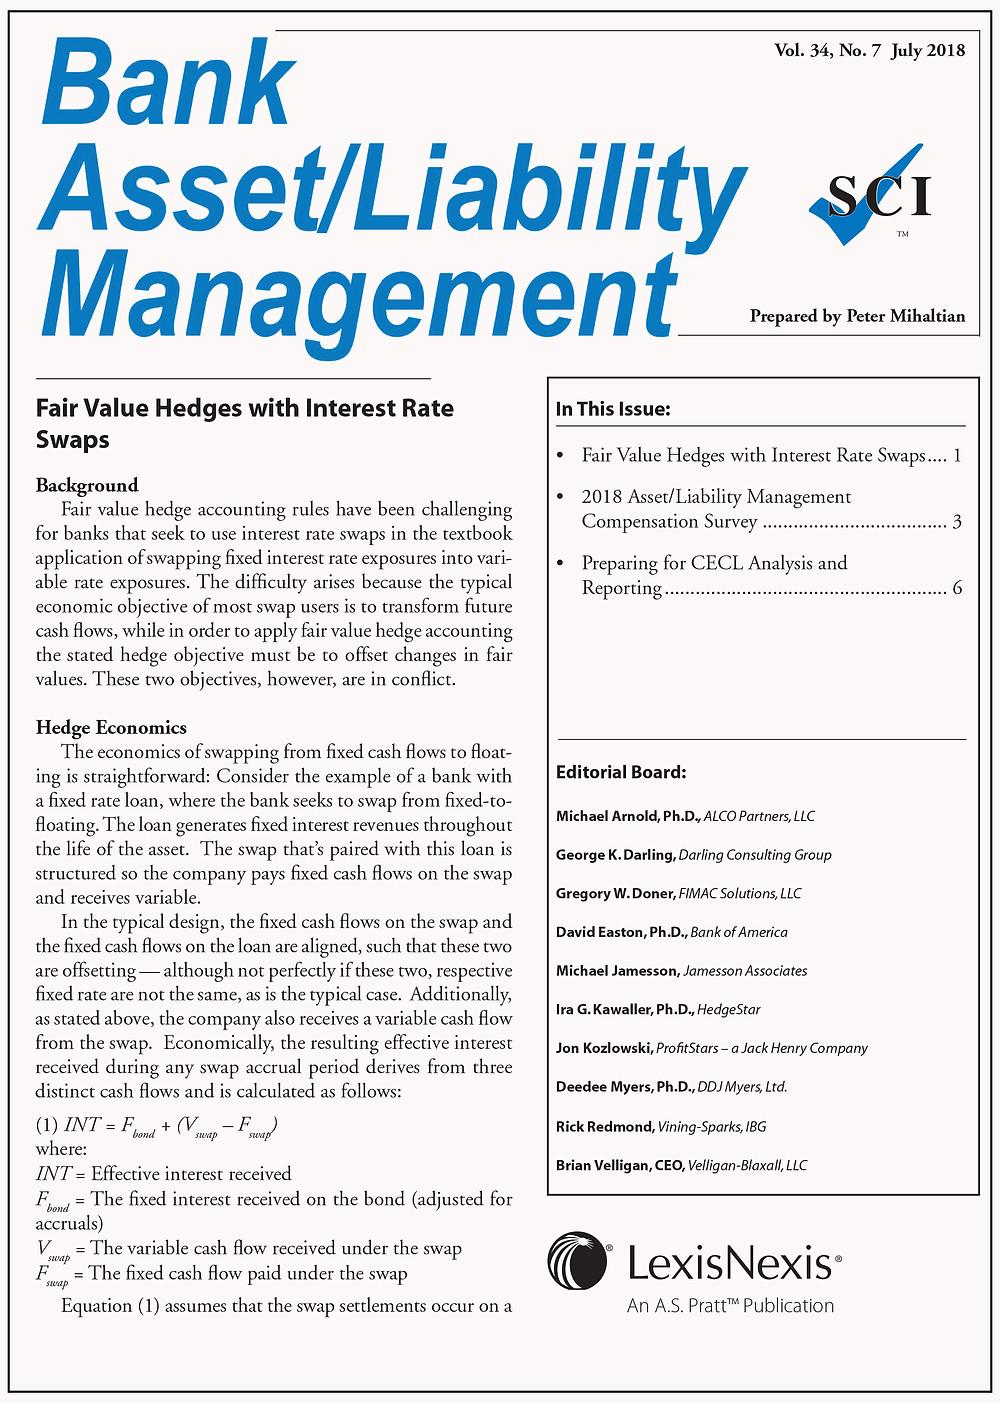 Bank Asset/Liability Management